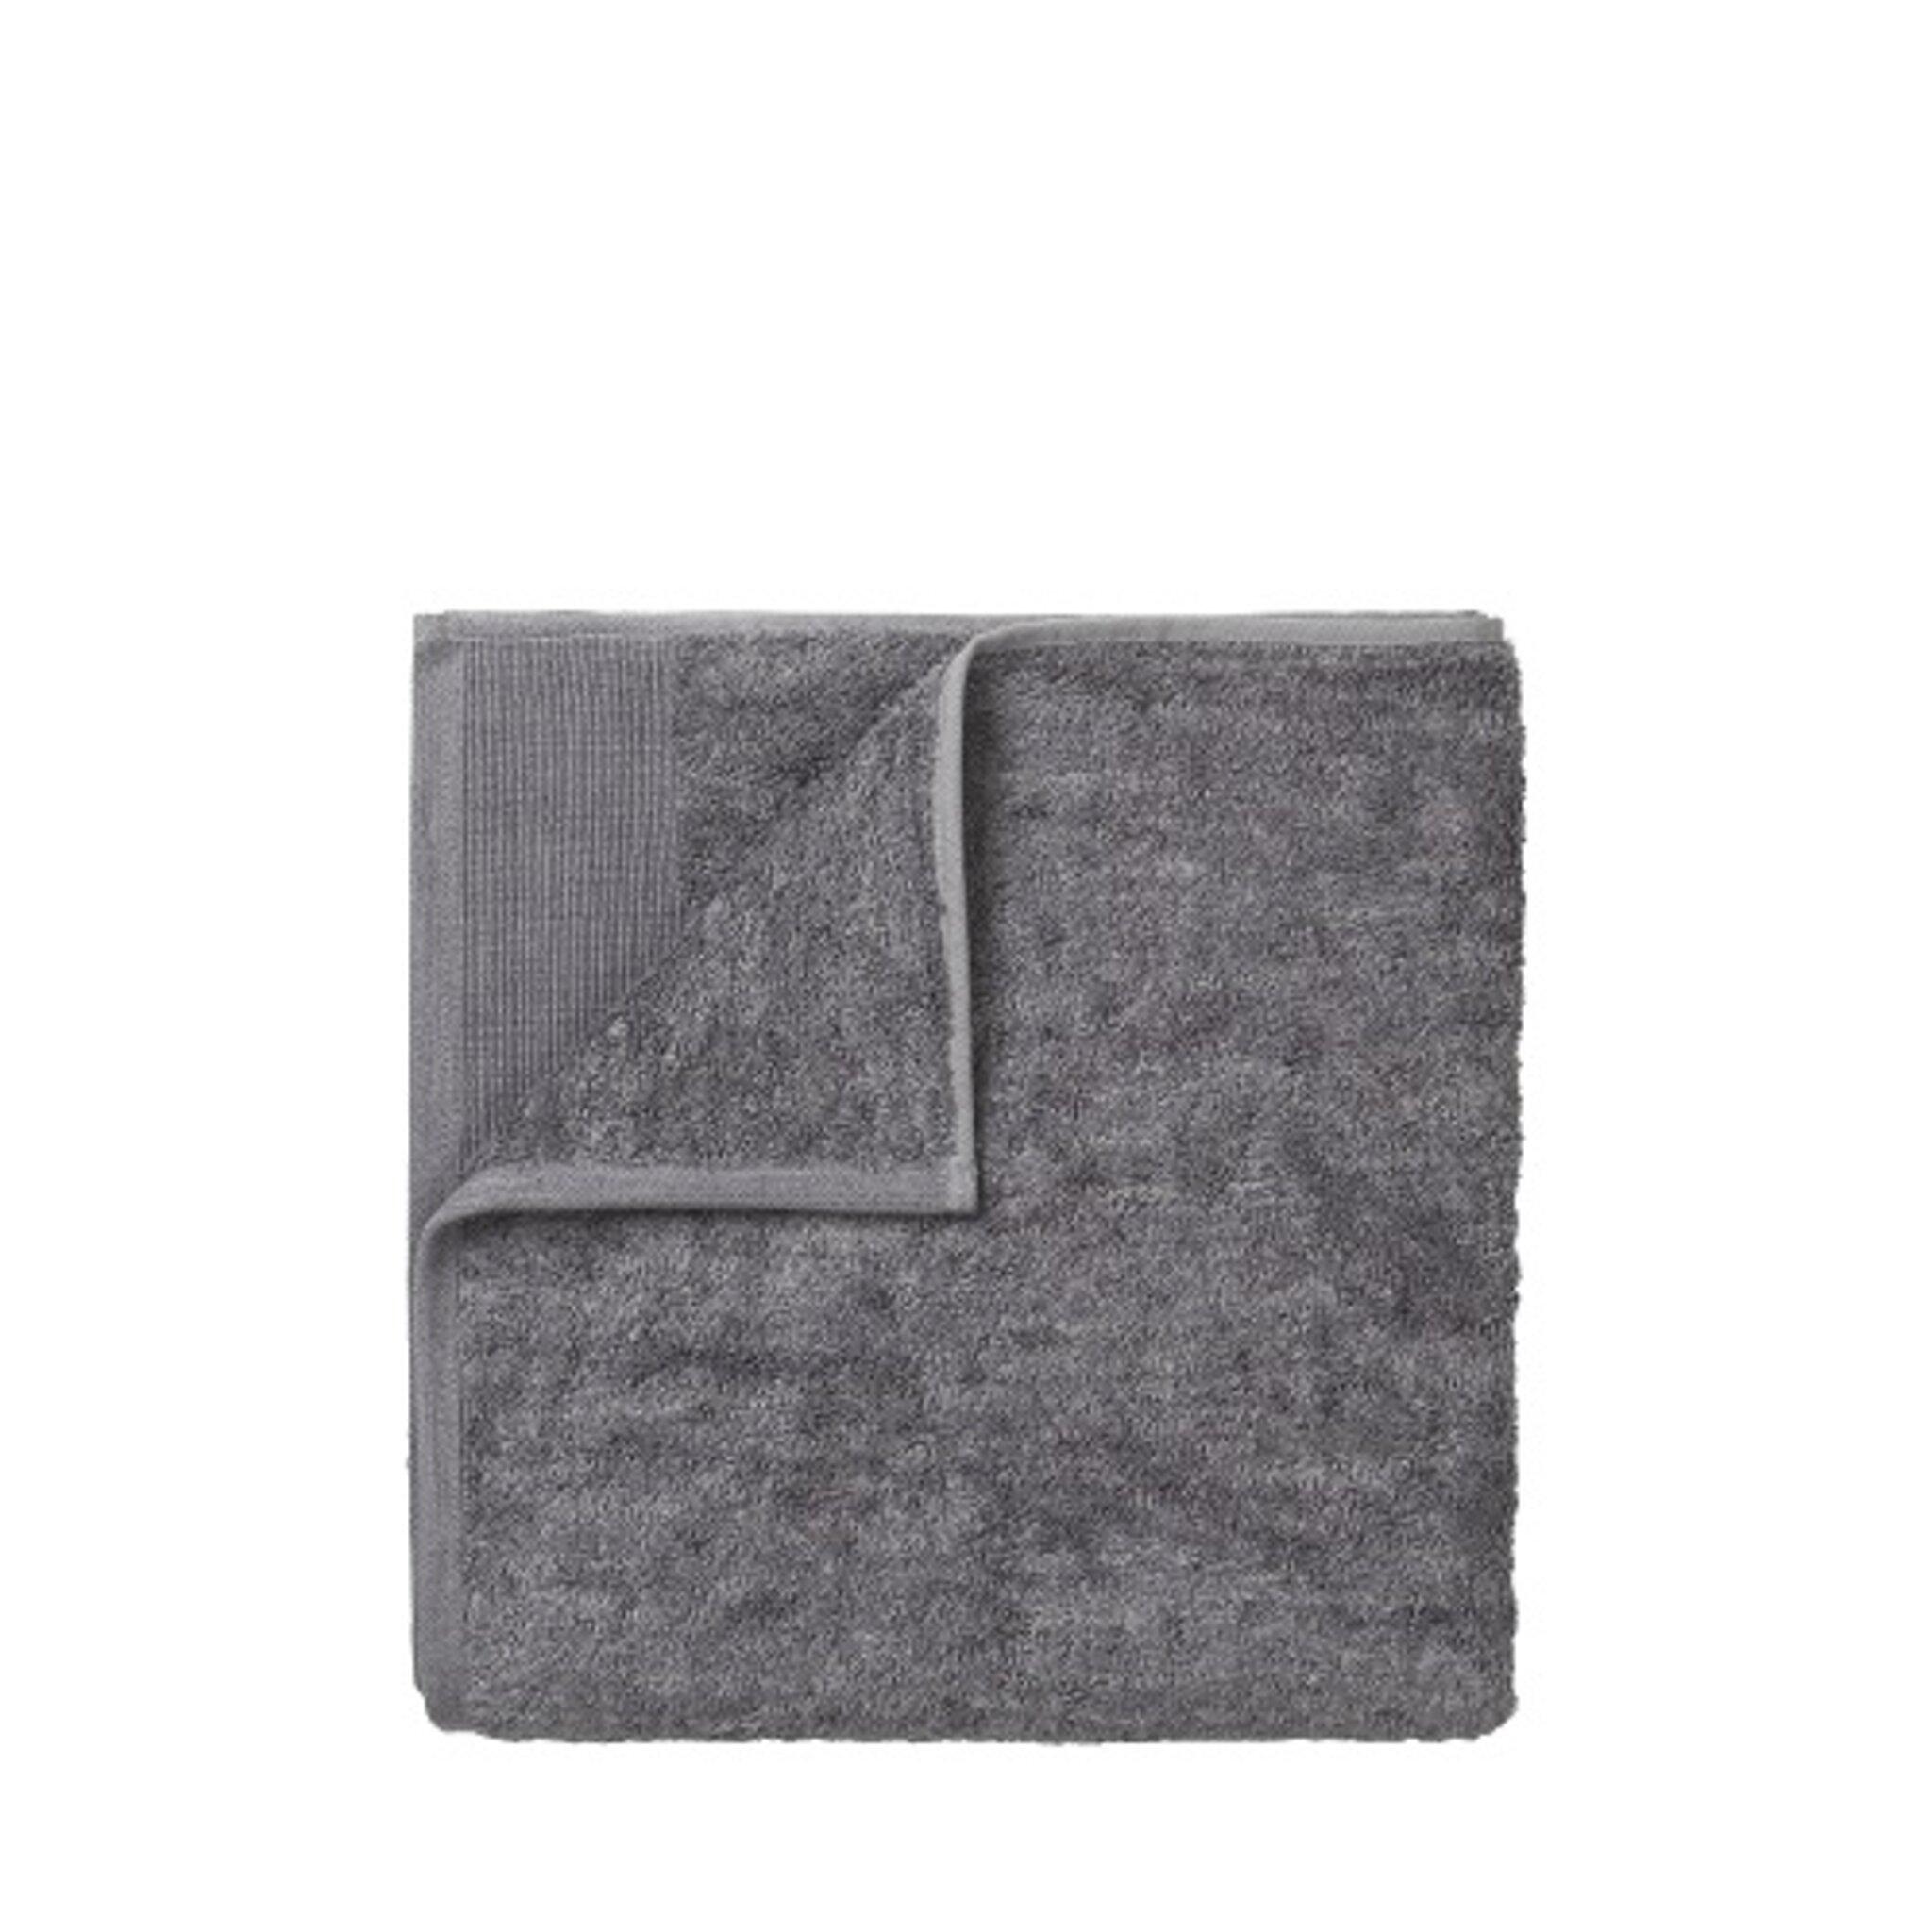 GIO Handduk 50x100 cm